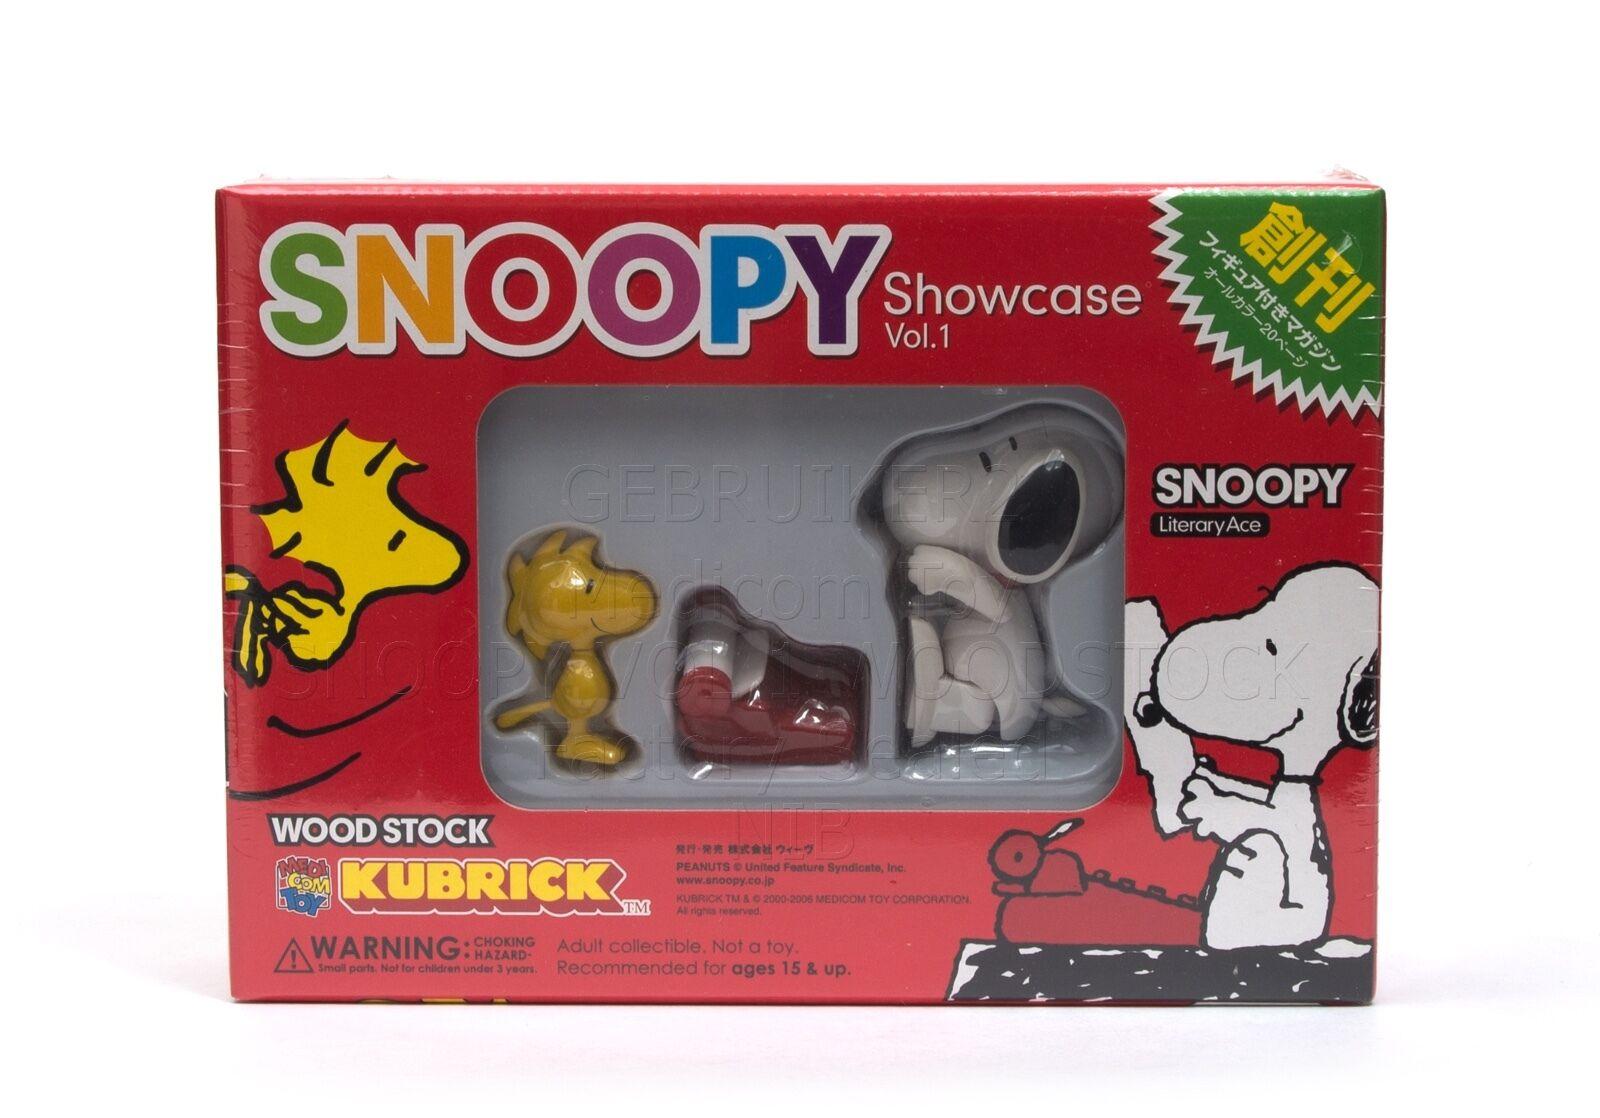 Medicom Toy Kubrick SNOOPY Showcase VOL. 1 WOODSTOCK NIB